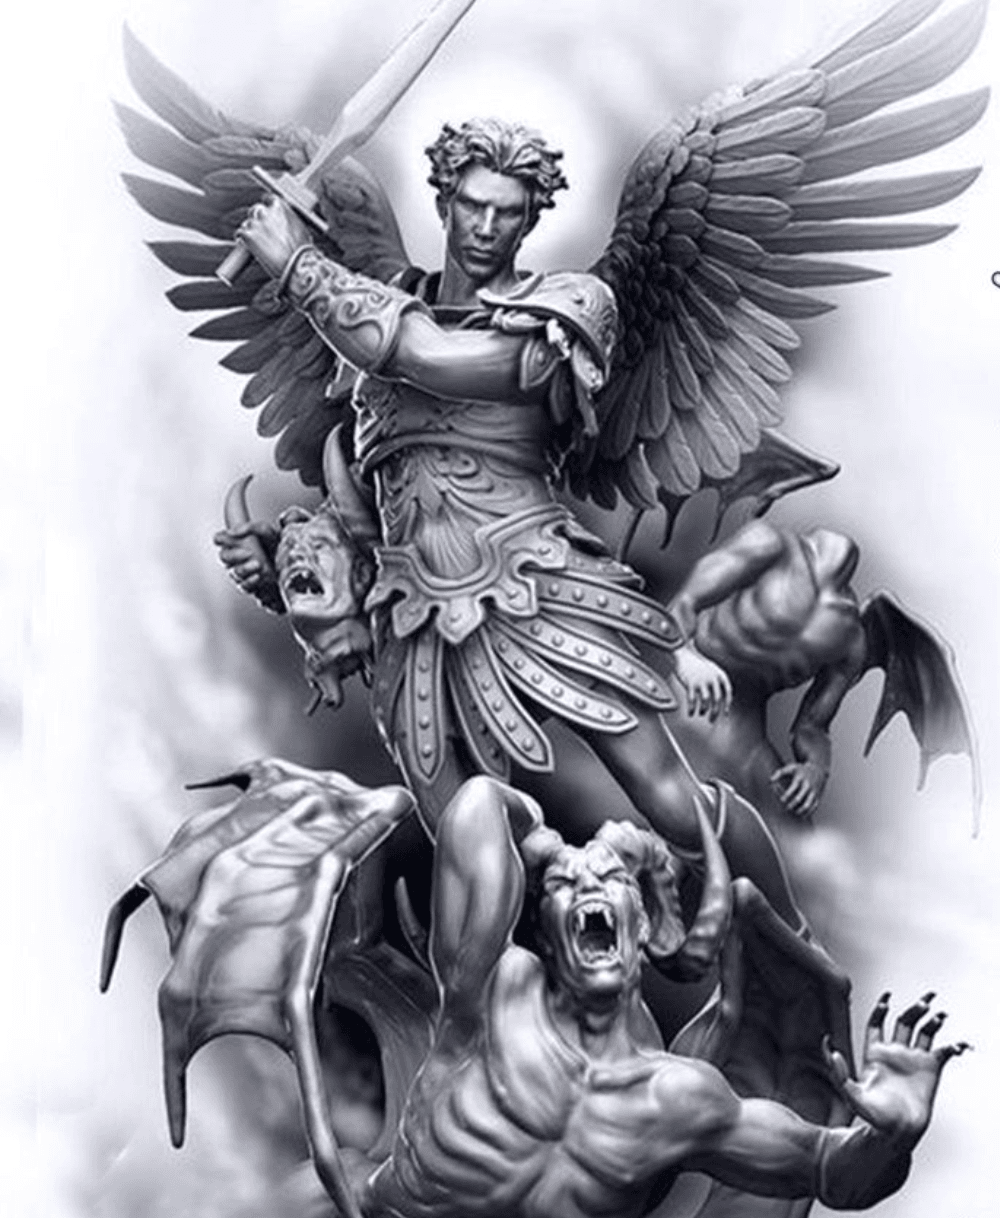 Capa de Bom Demônio